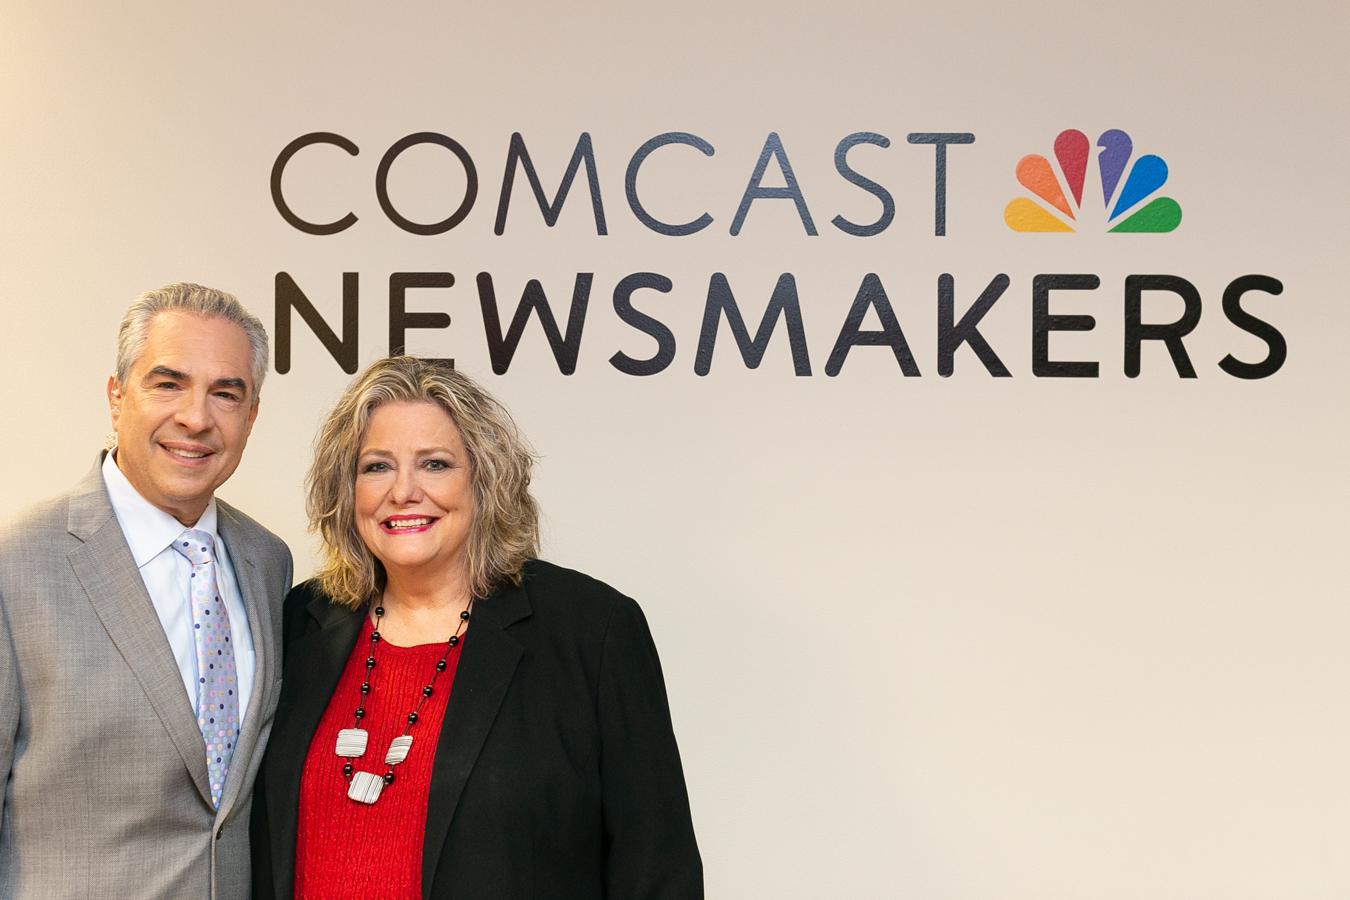 Paul M Lisnek and Cynthia K Wade